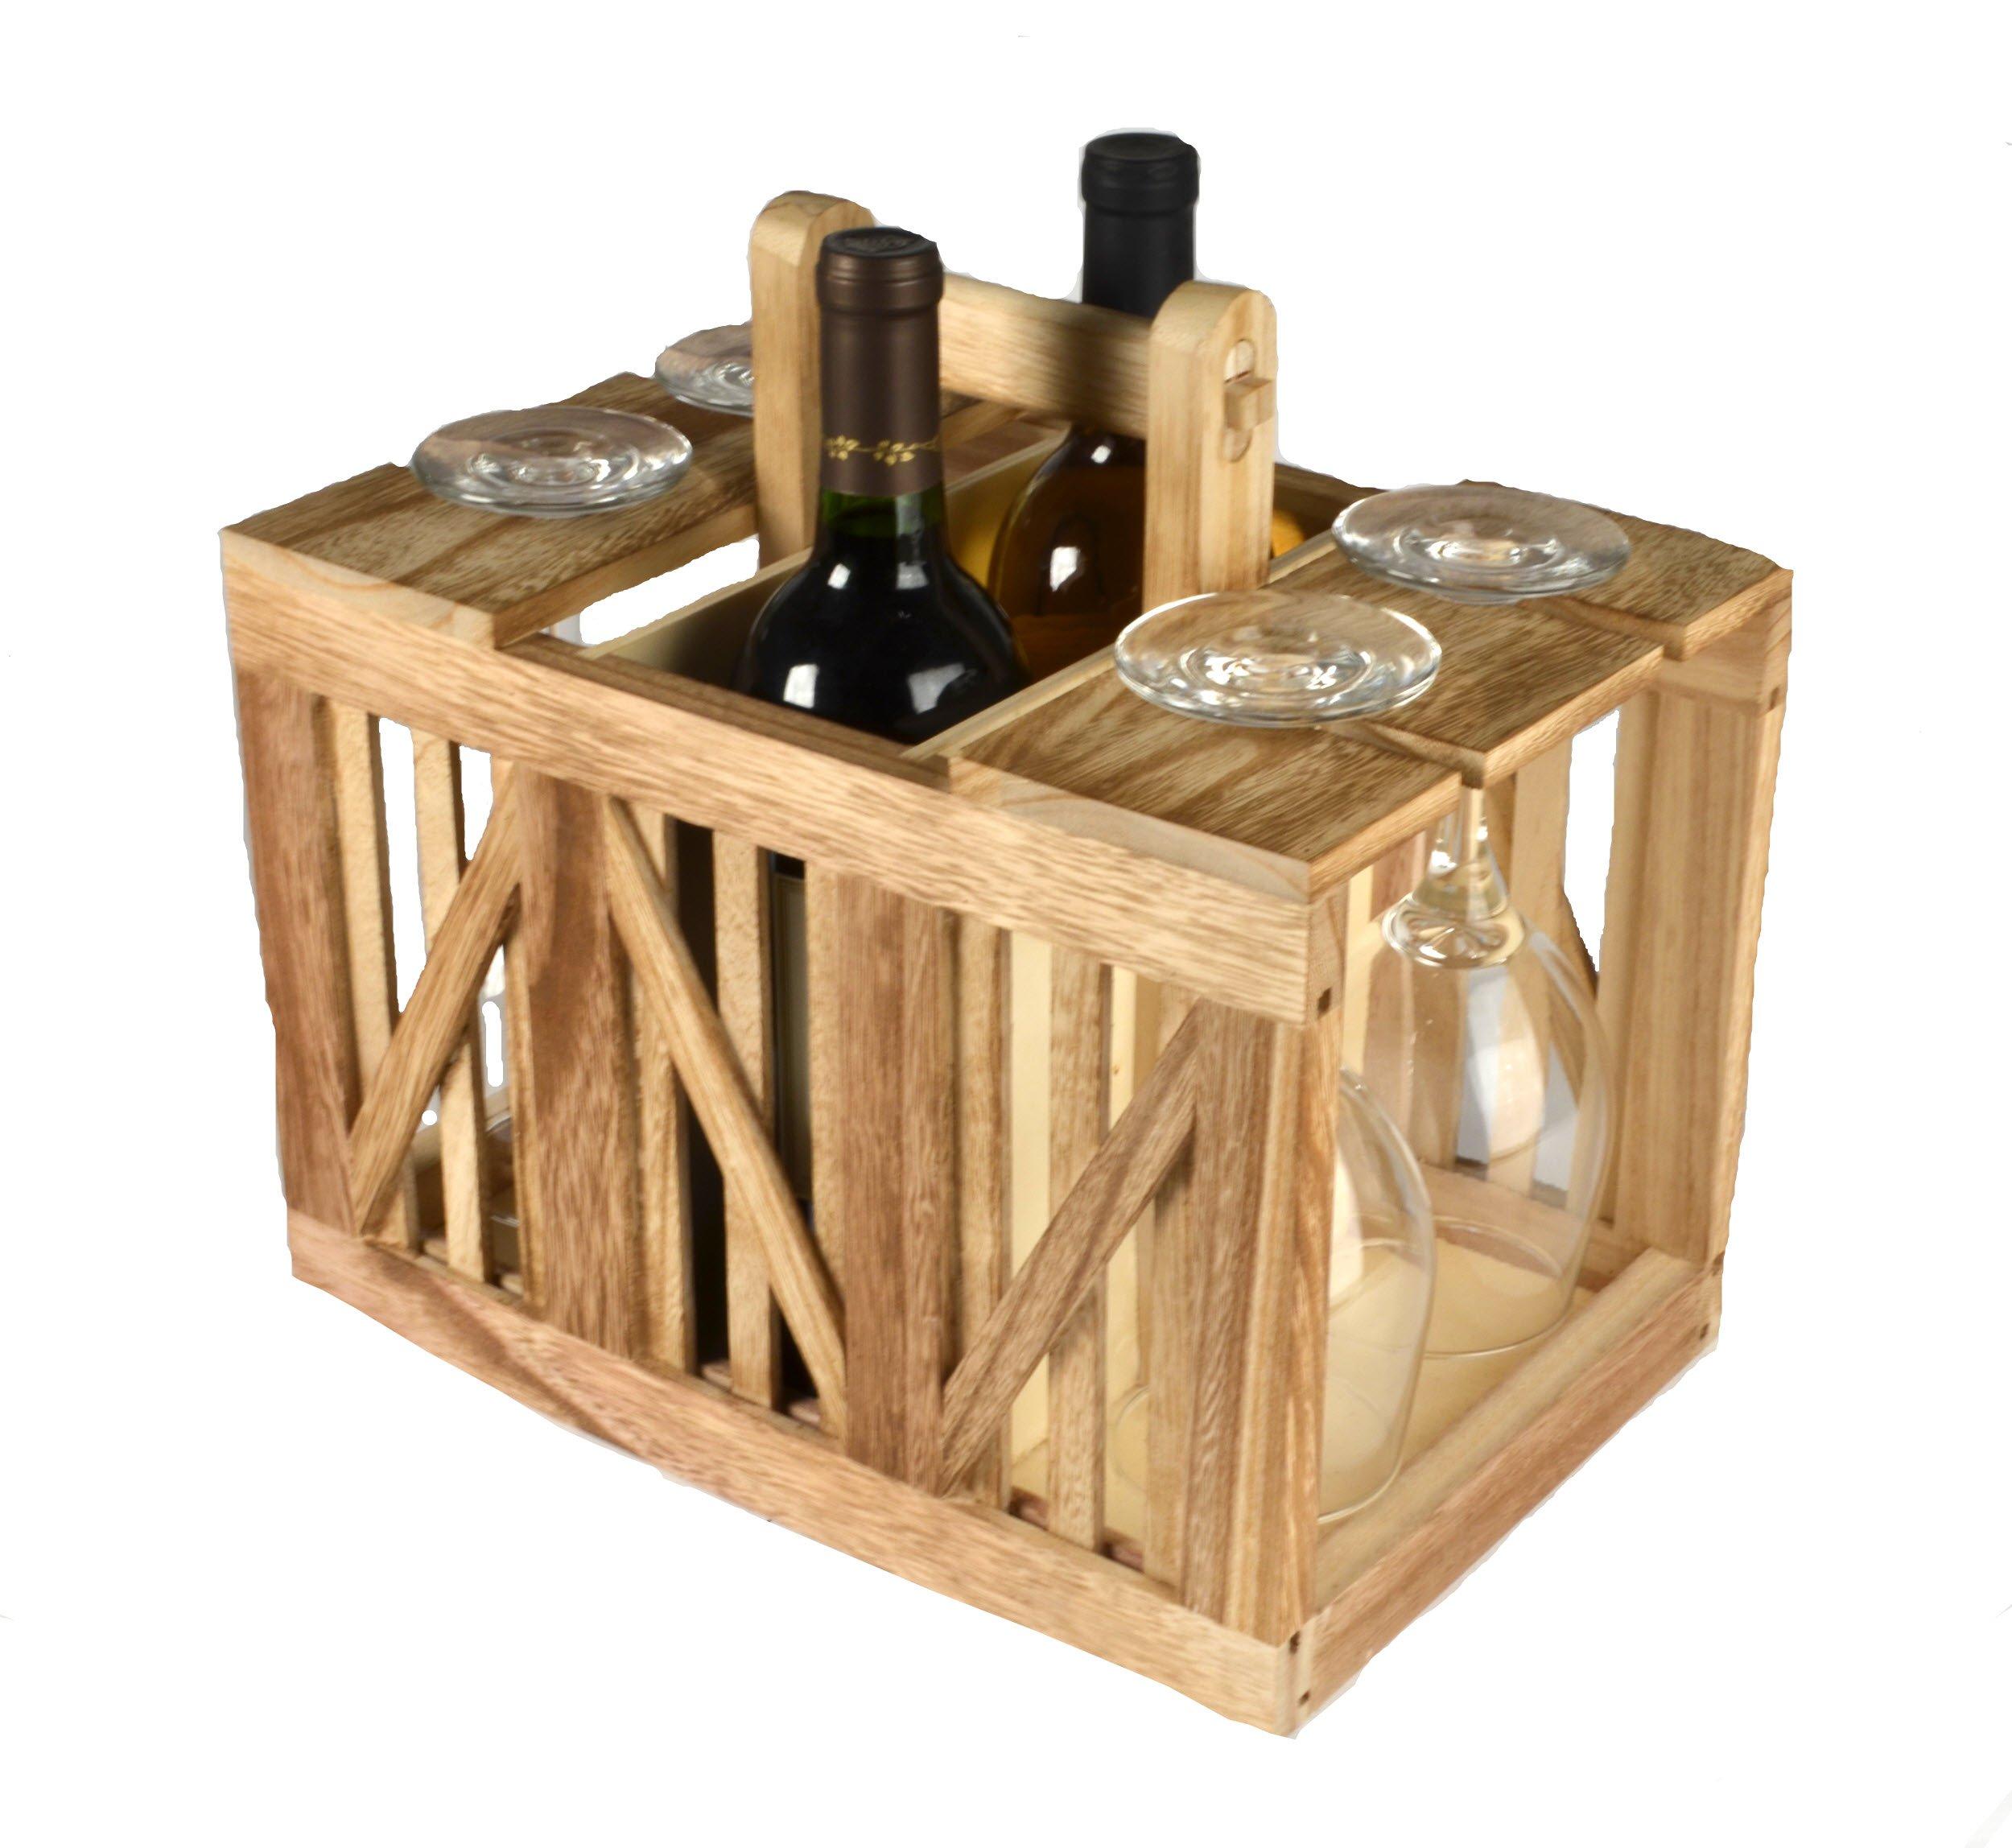 Artland 22109 Home Mixology Wine Caddy Wood Crate, Beige